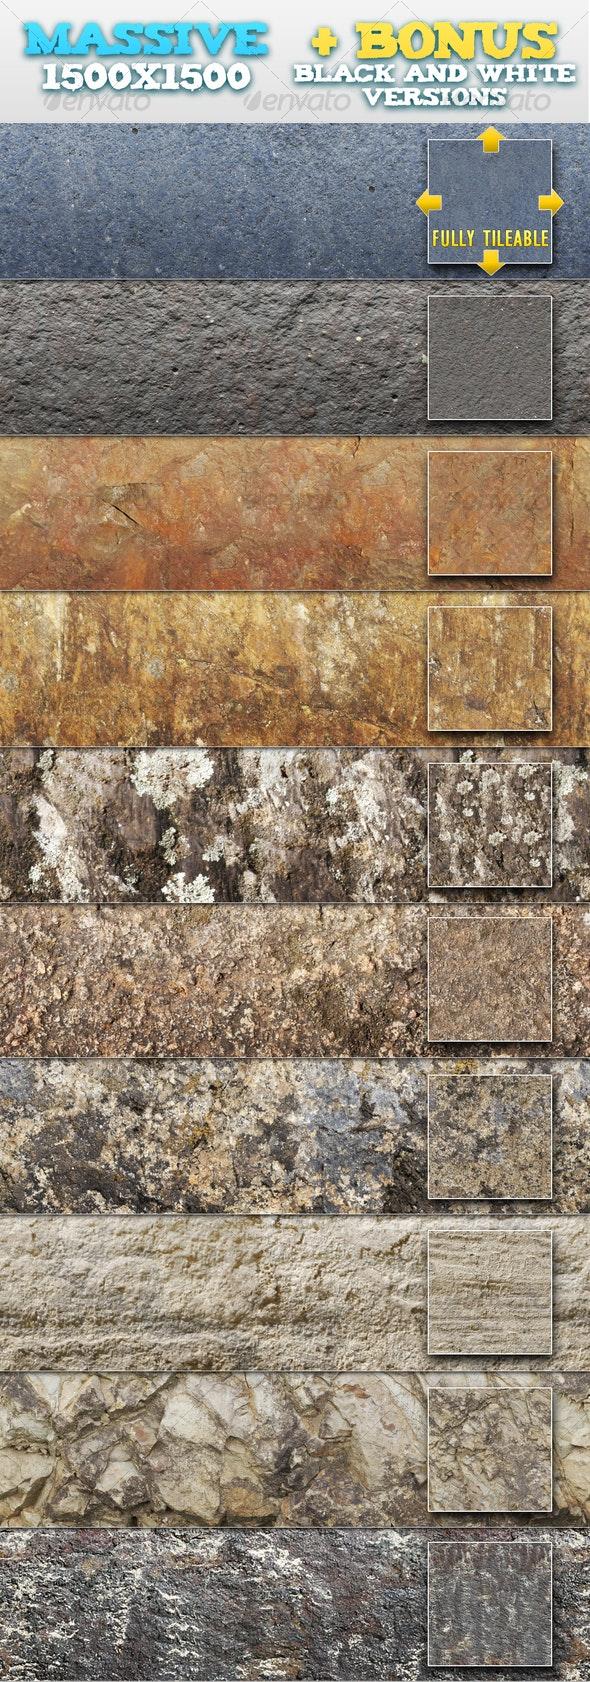 10 Natural Rock / Stone Patterns + BONUSES - Textures / Fills / Patterns Photoshop